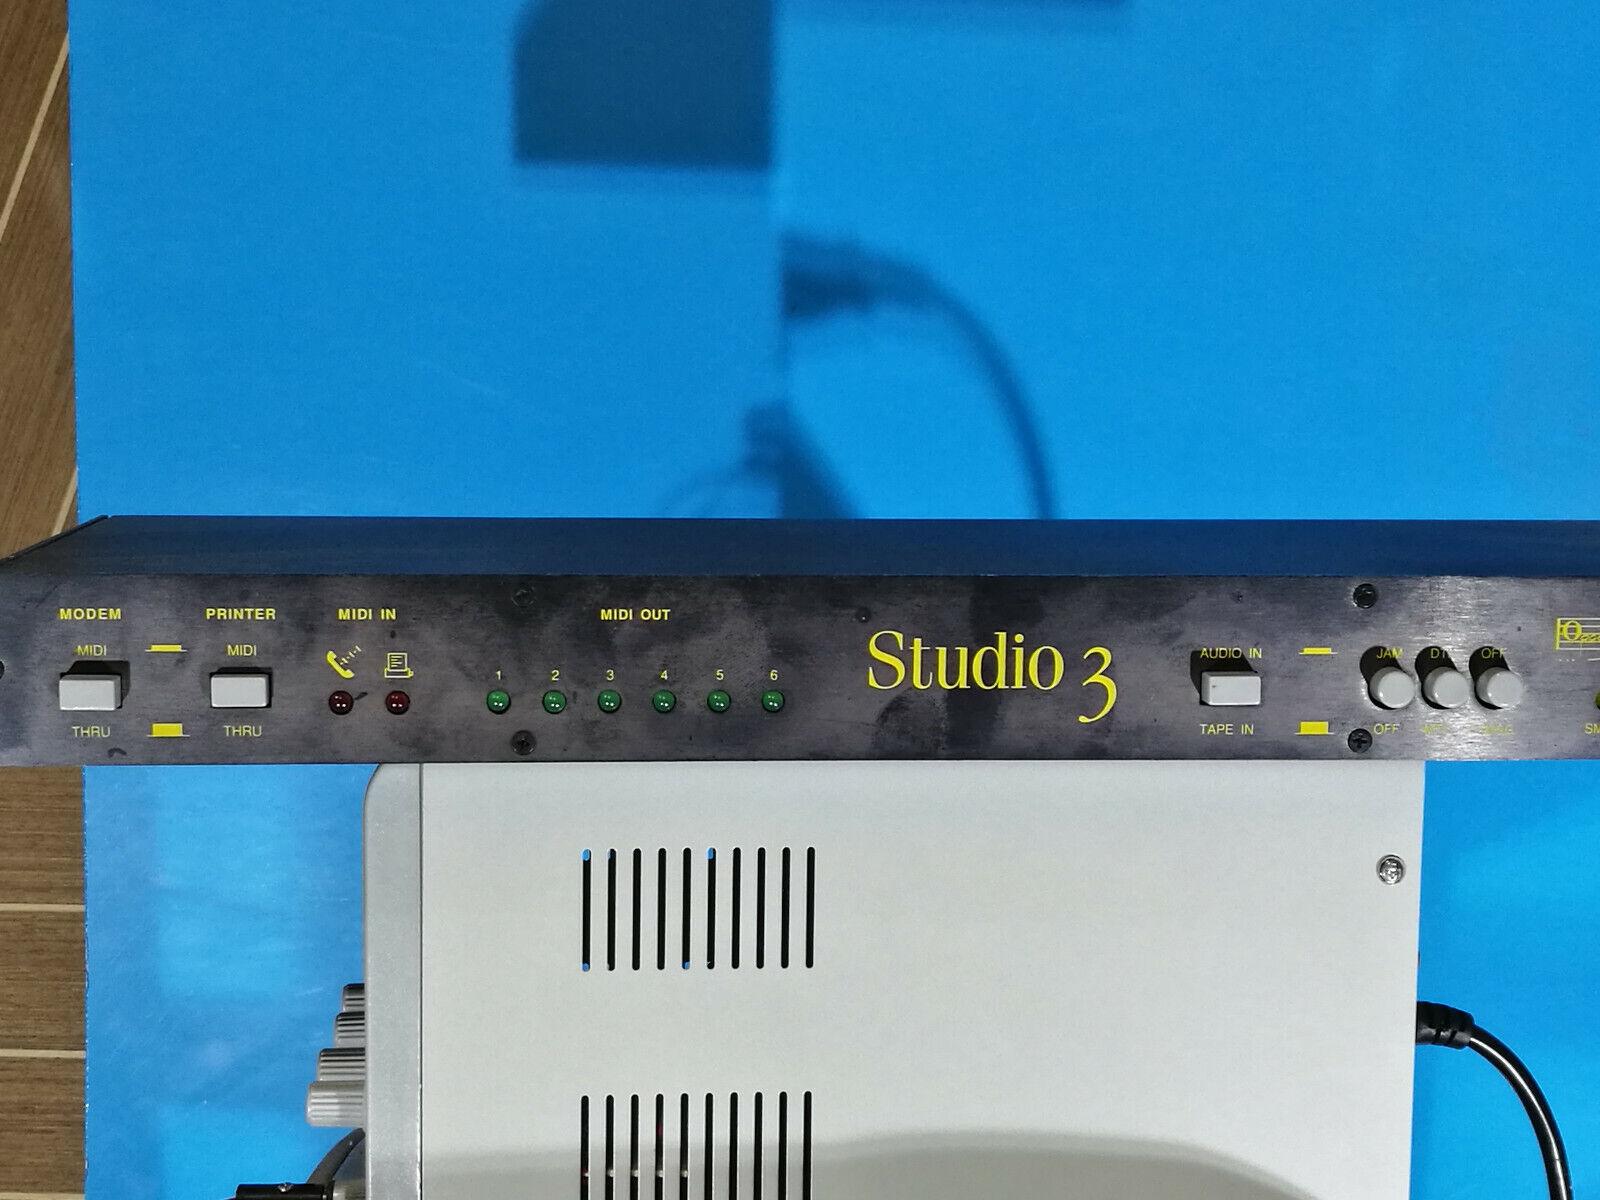 Opcode studio 3 rackmount midi interface